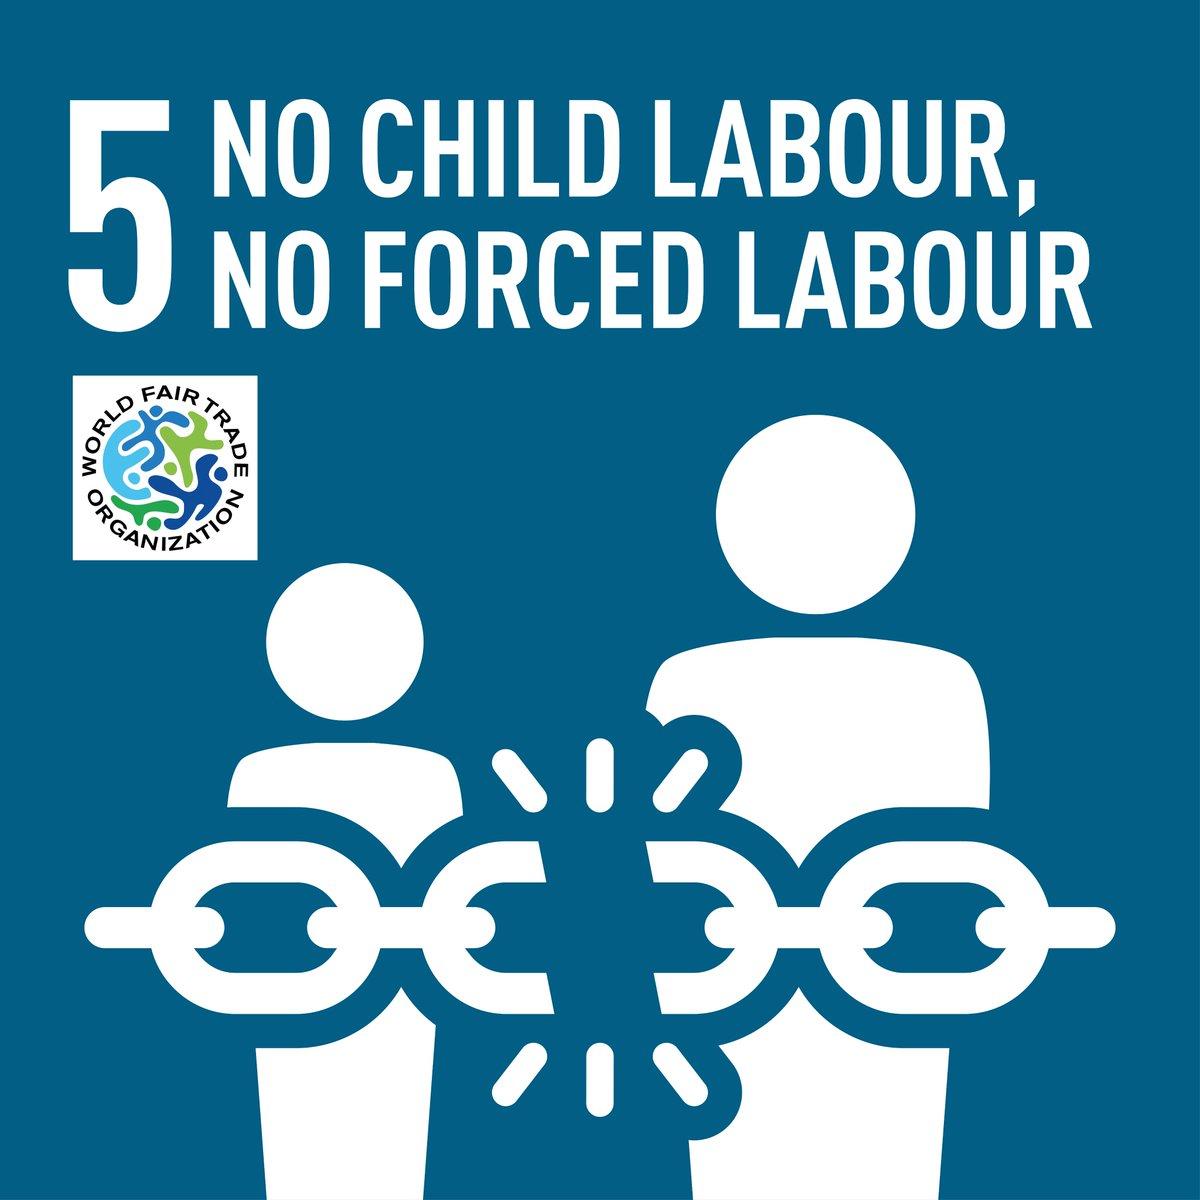 World Fair Trade Organization on Twitter: